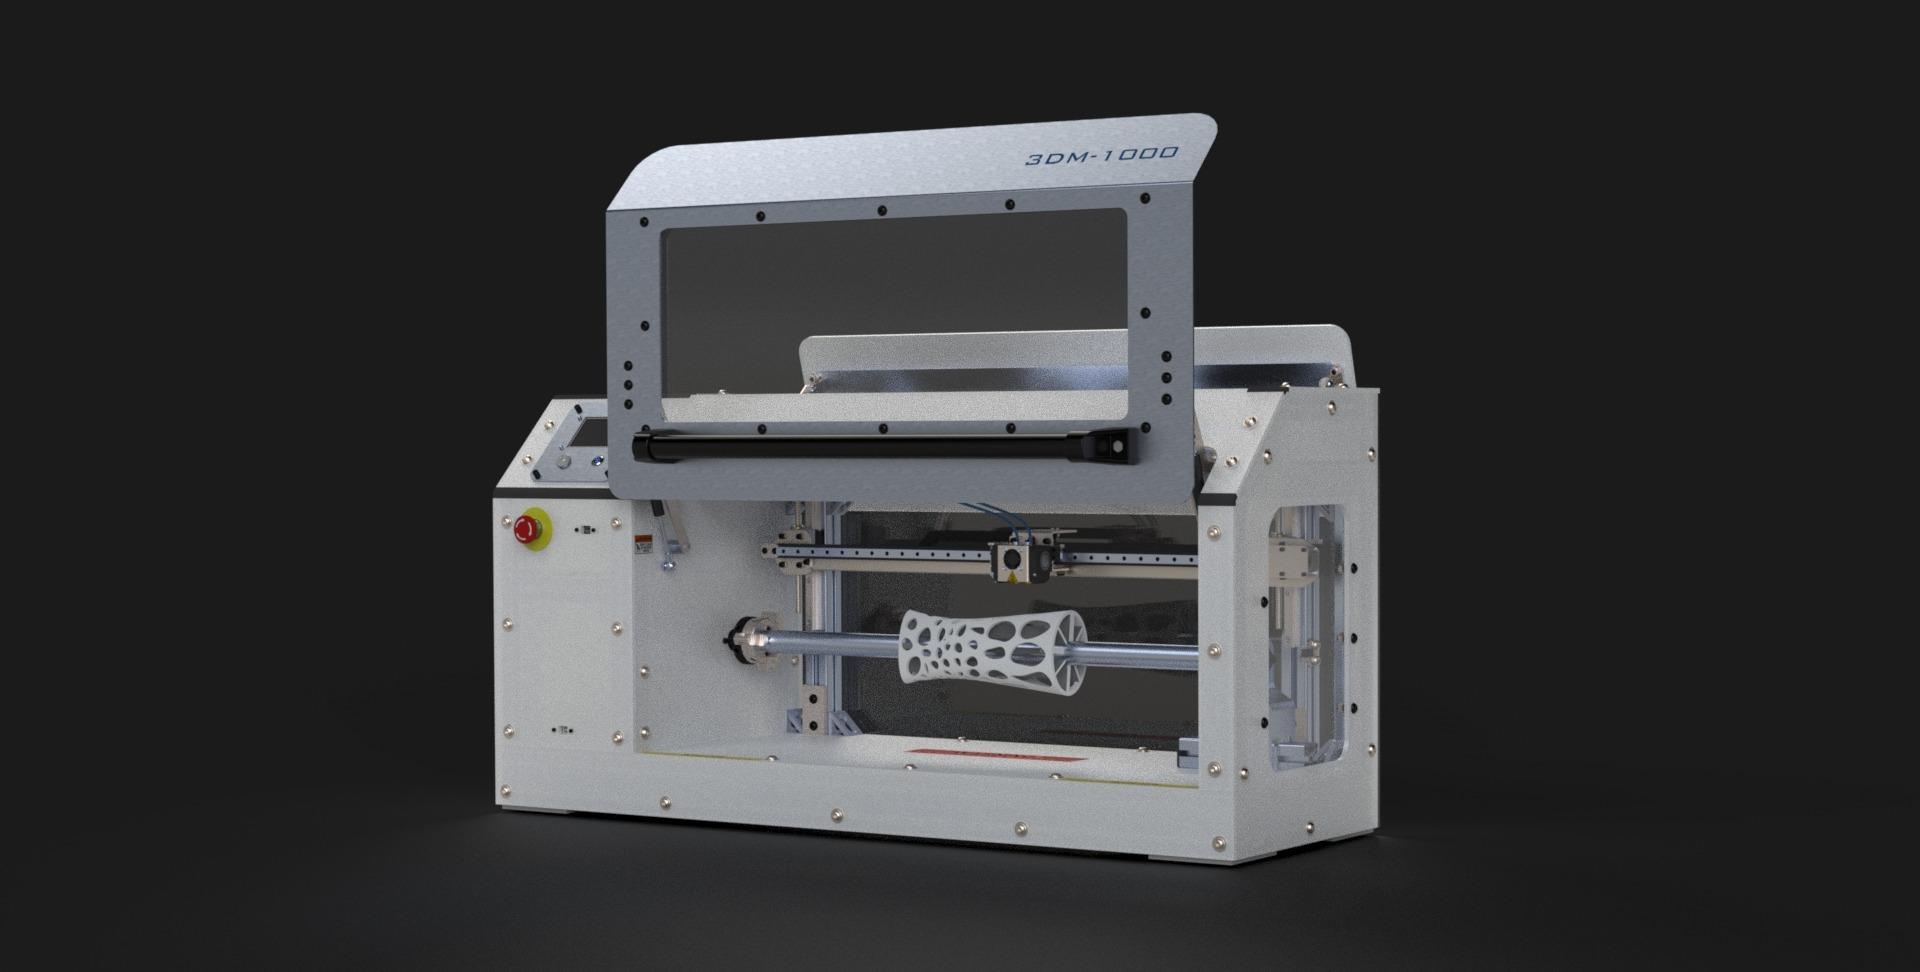 3DM-1000_3-1